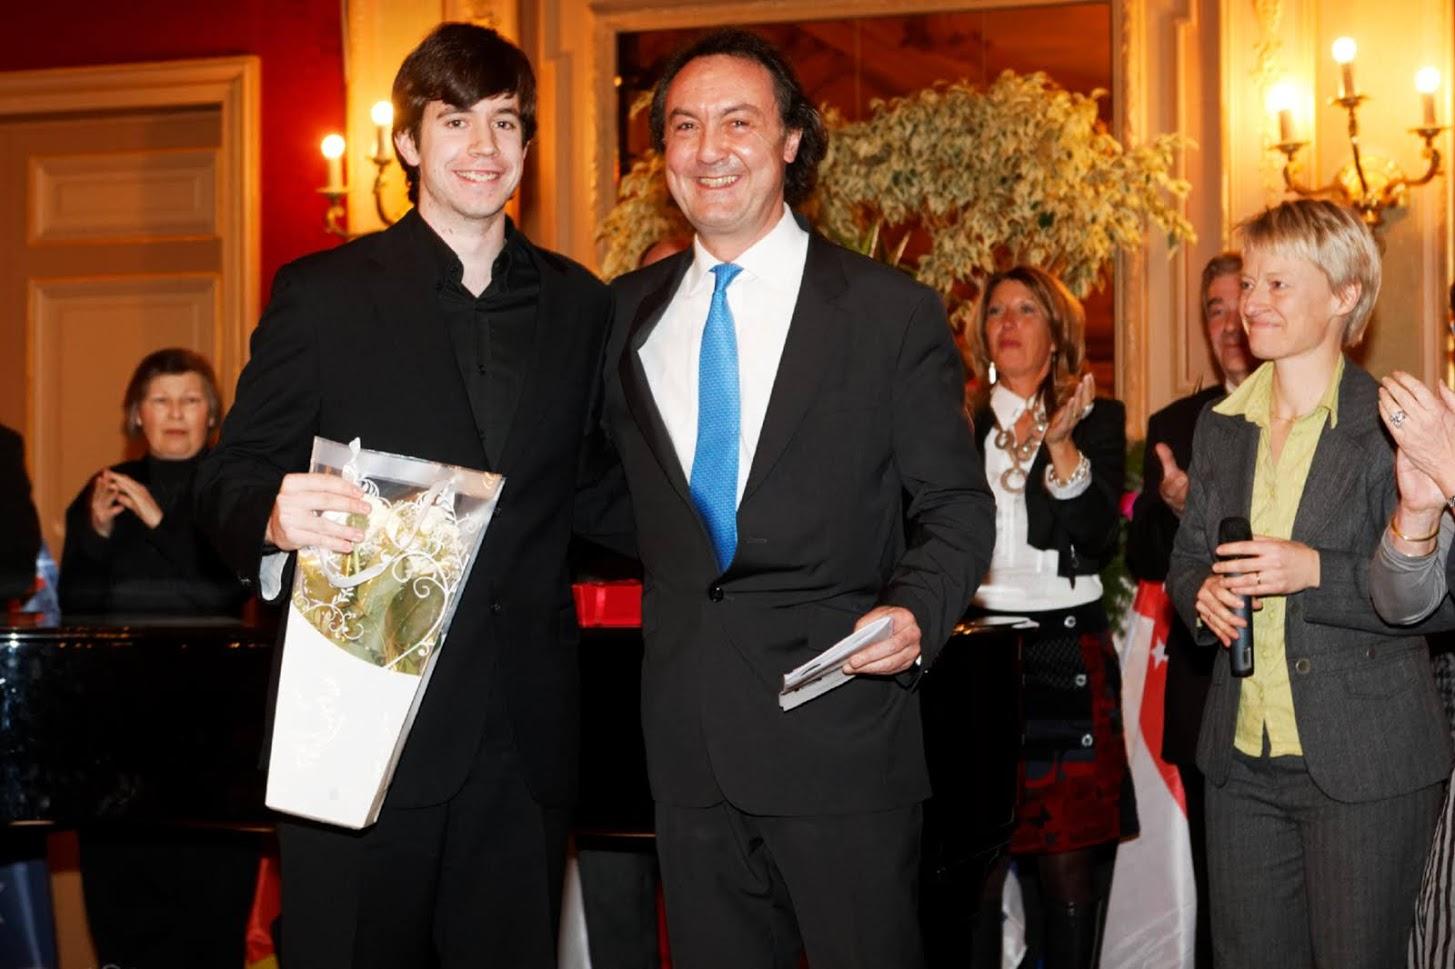 With Mario Mora Saiz